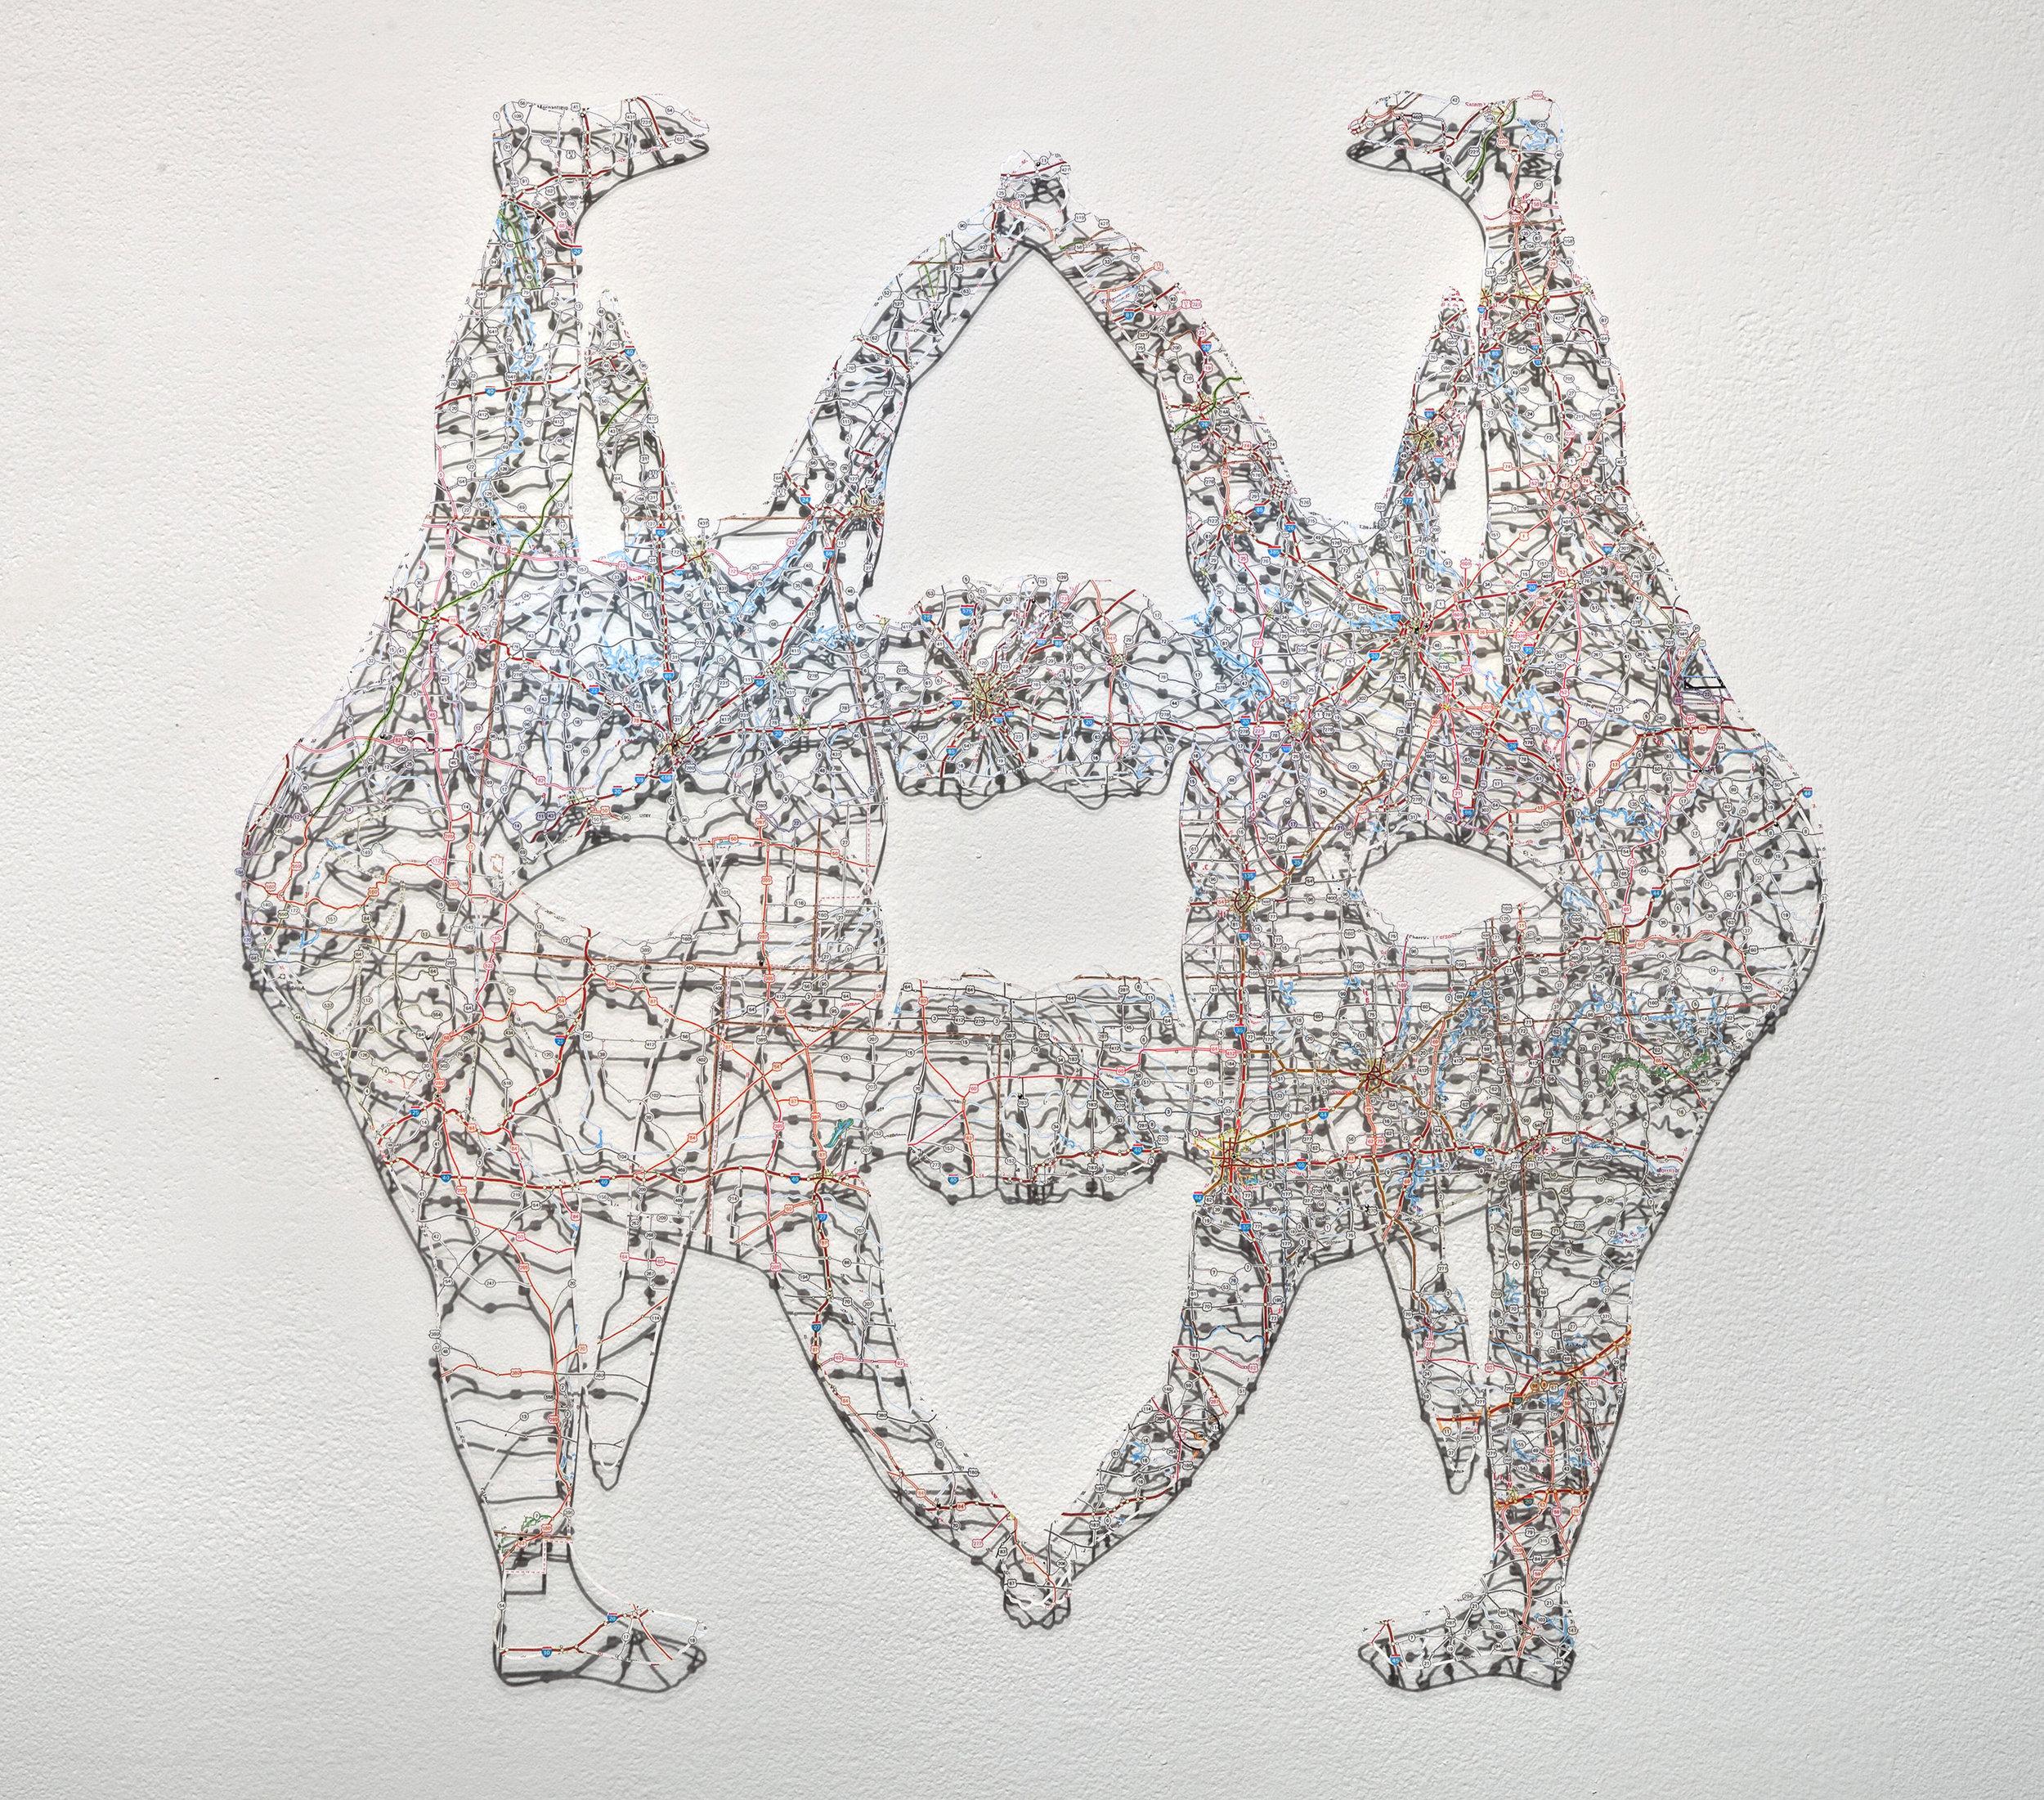 Untitled (Object IX) , 24x24 in, hand-cut road map, 2017